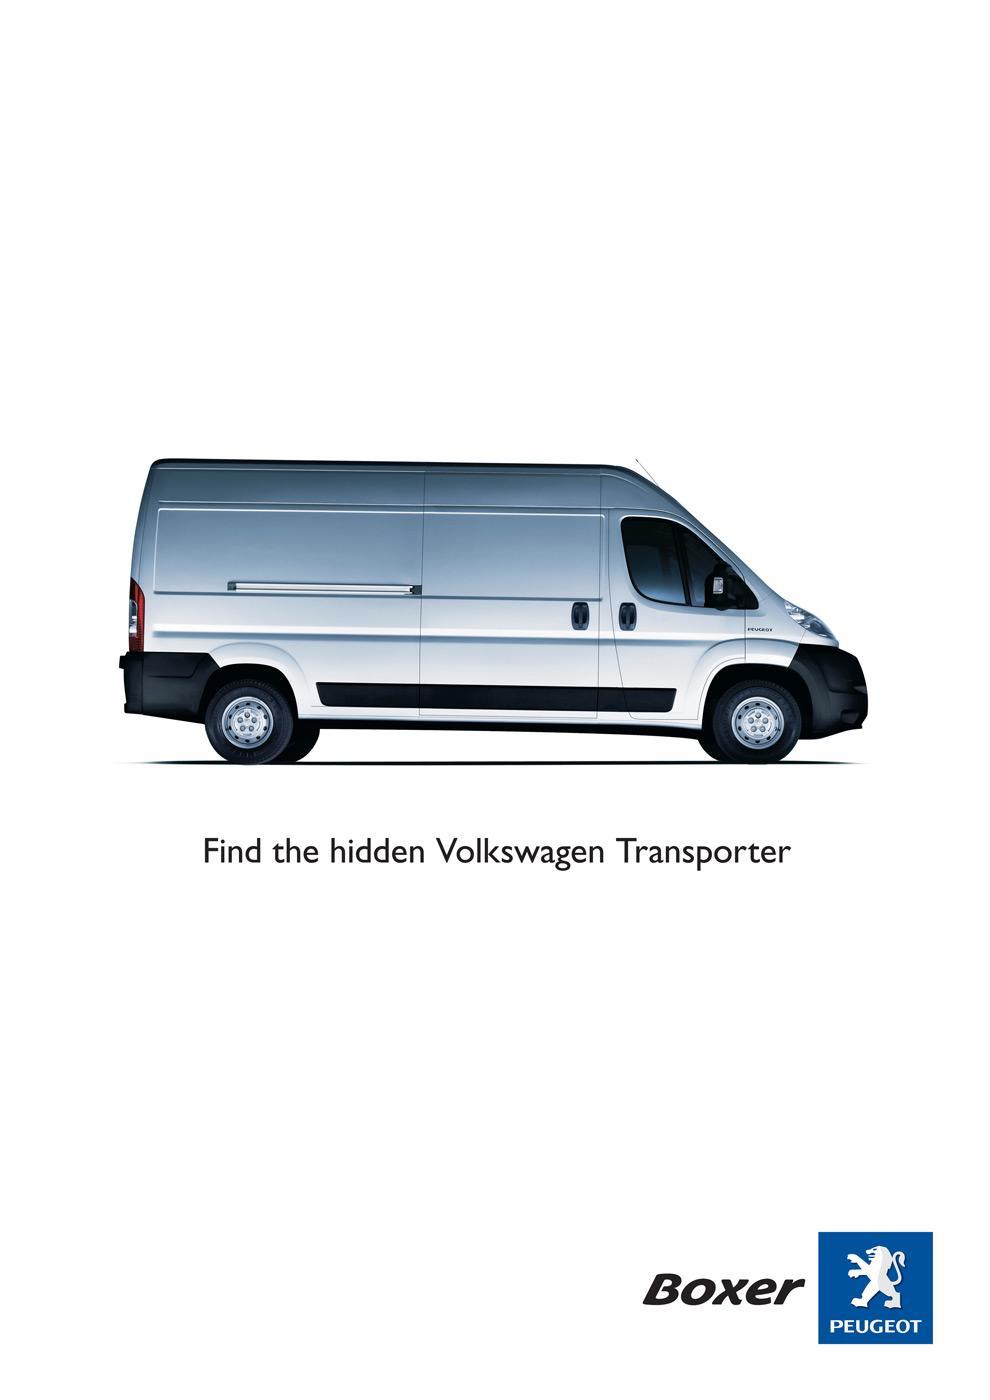 Find The Hidden Transporter